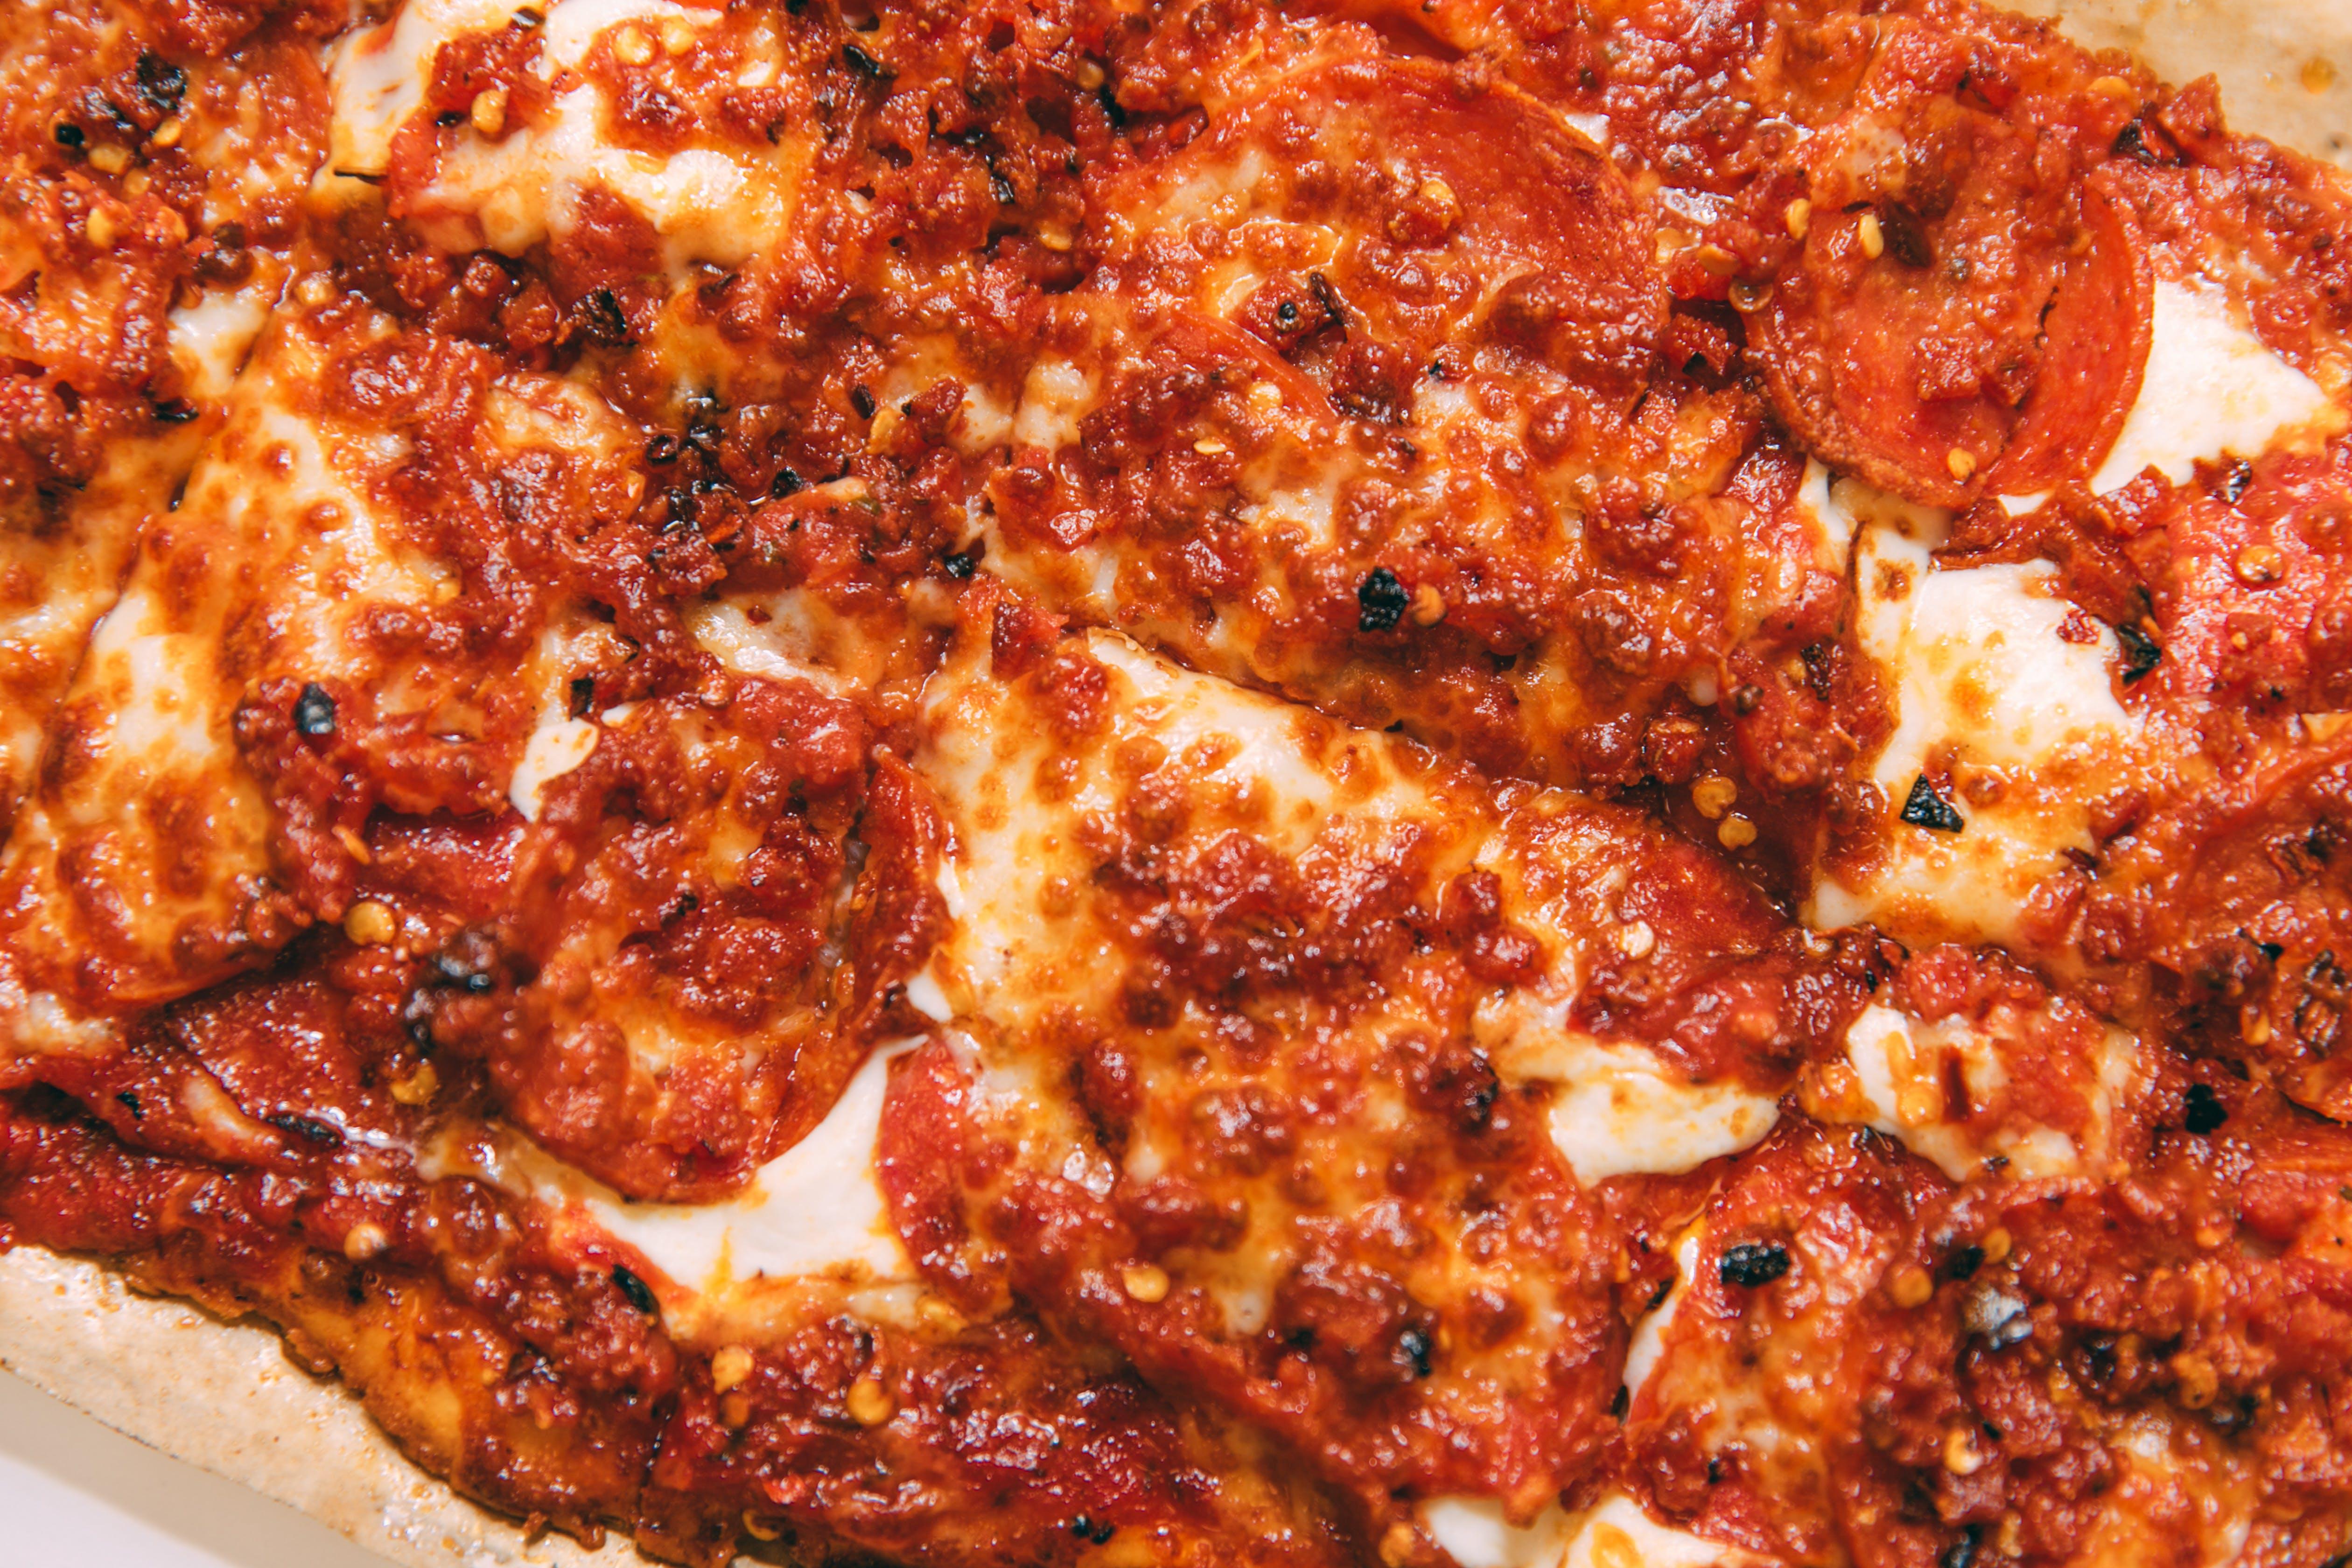 Slim & Husky's - Rony Roni Rone Pizza - 4 Pack